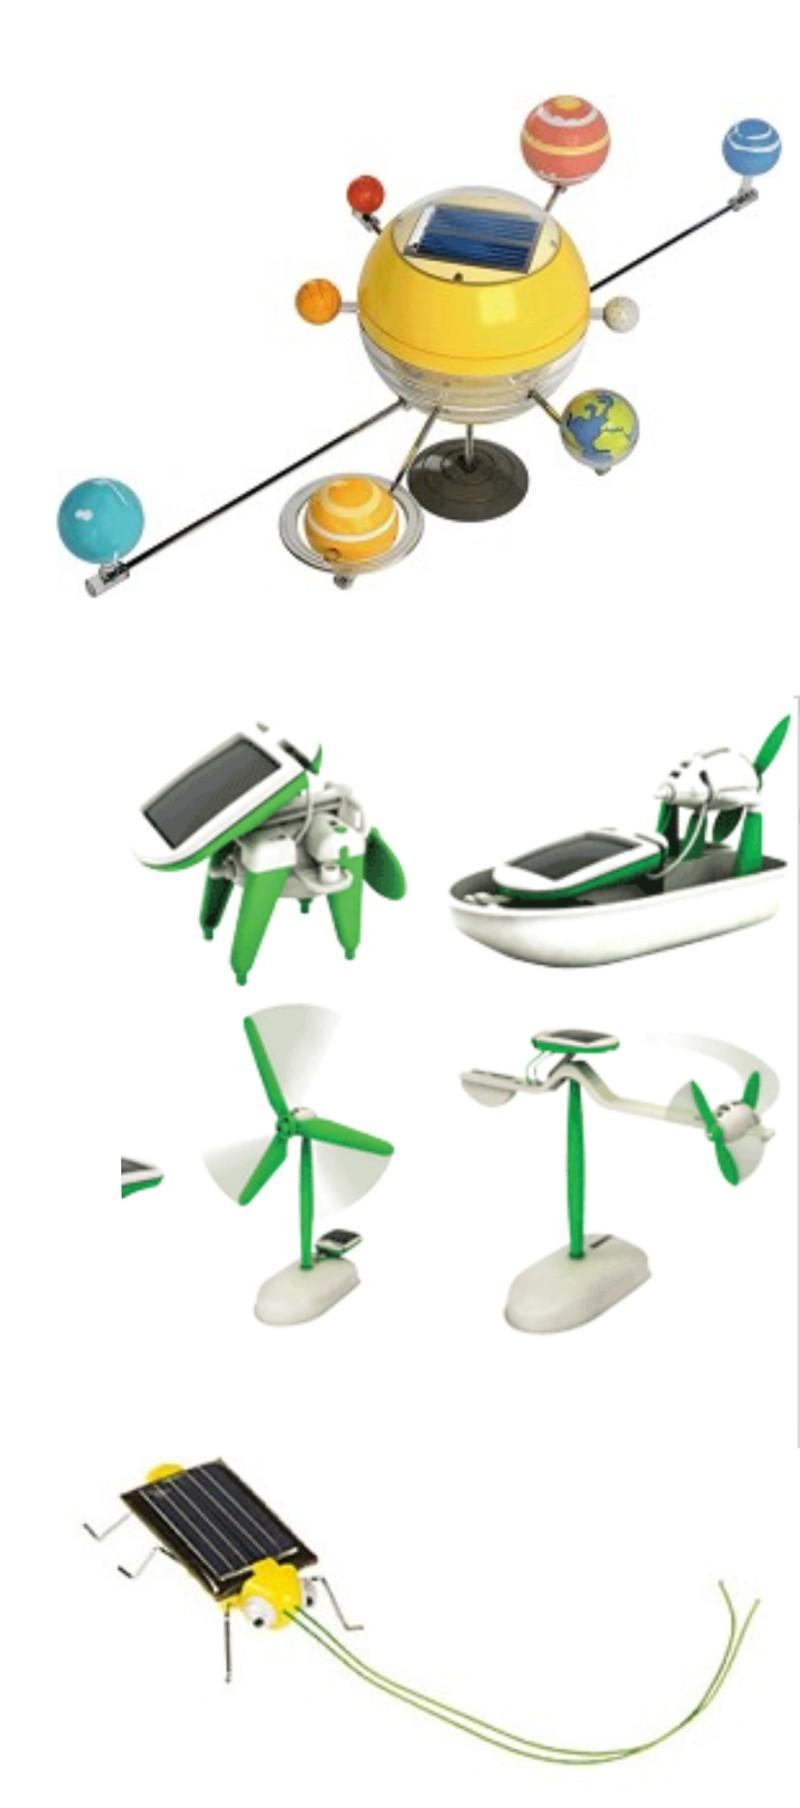 brinquedos movidos a energia solar